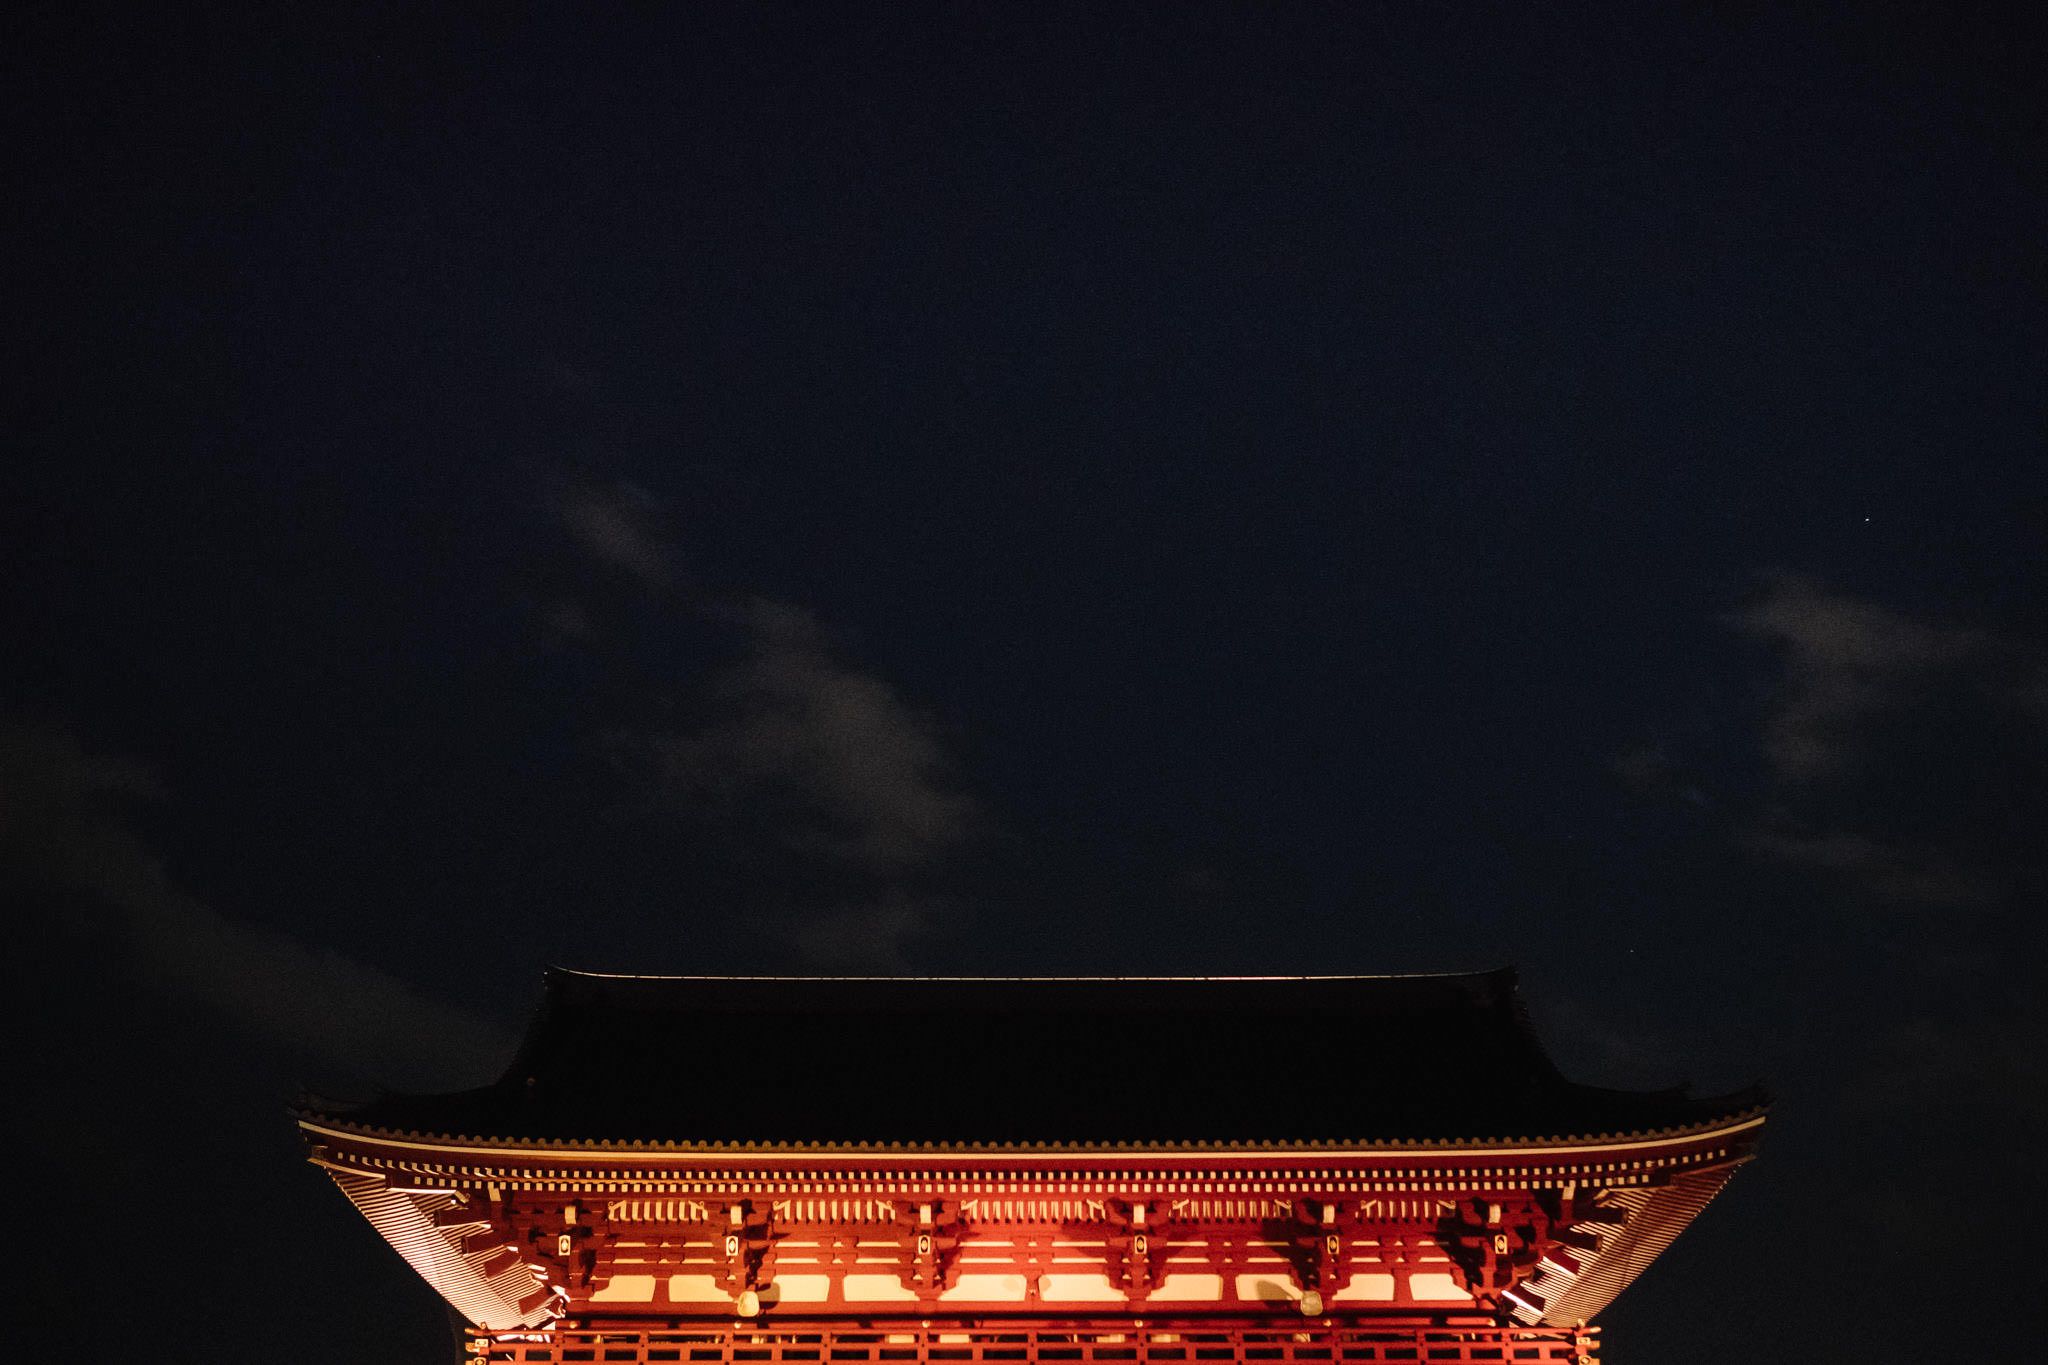 chris_eberhardt_japan_travel_reise_nippon-69.jpg